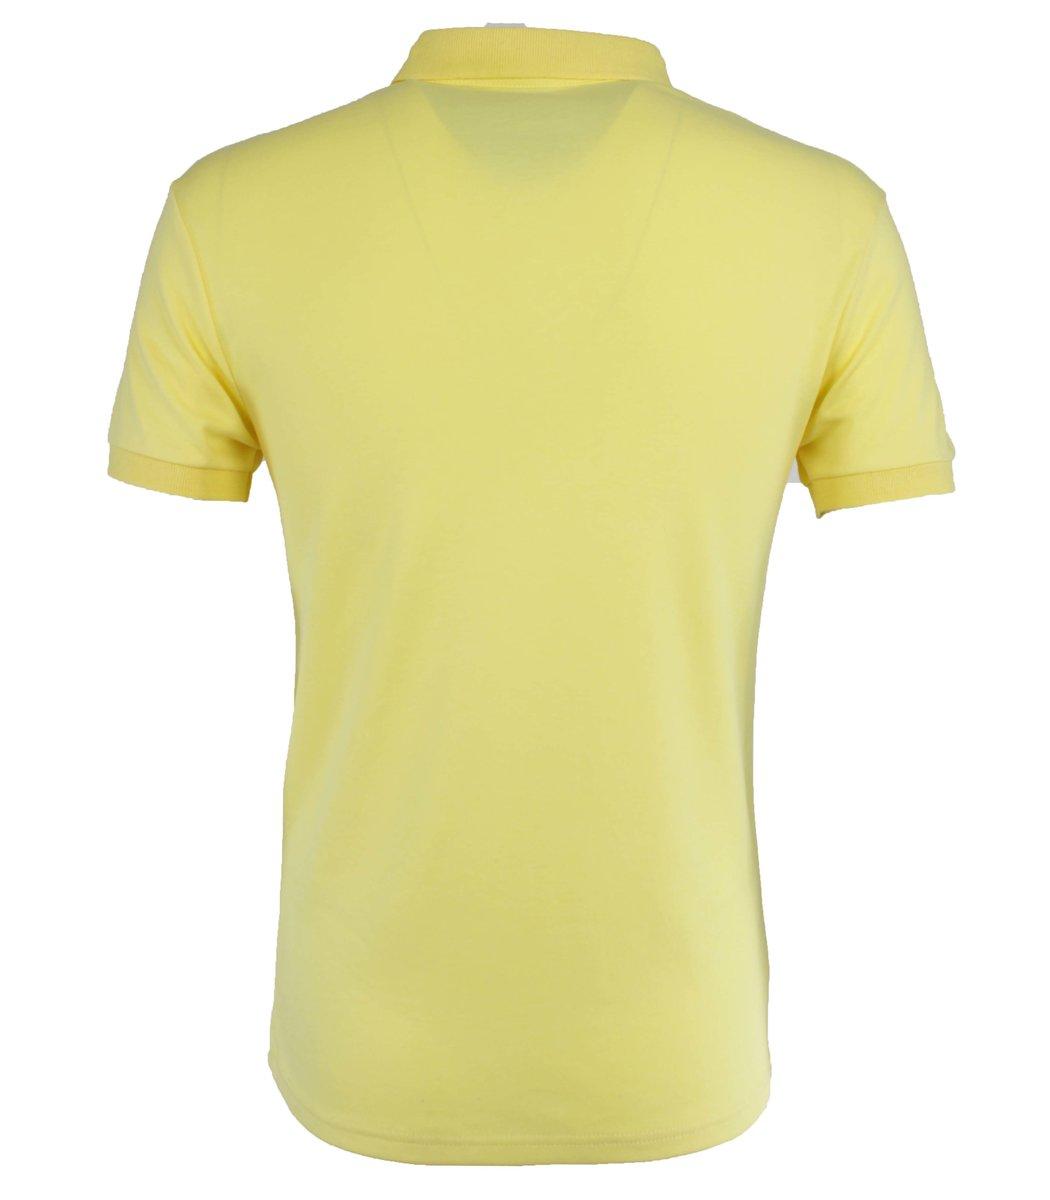 Желтая футболка поло Hugo Boss MH1